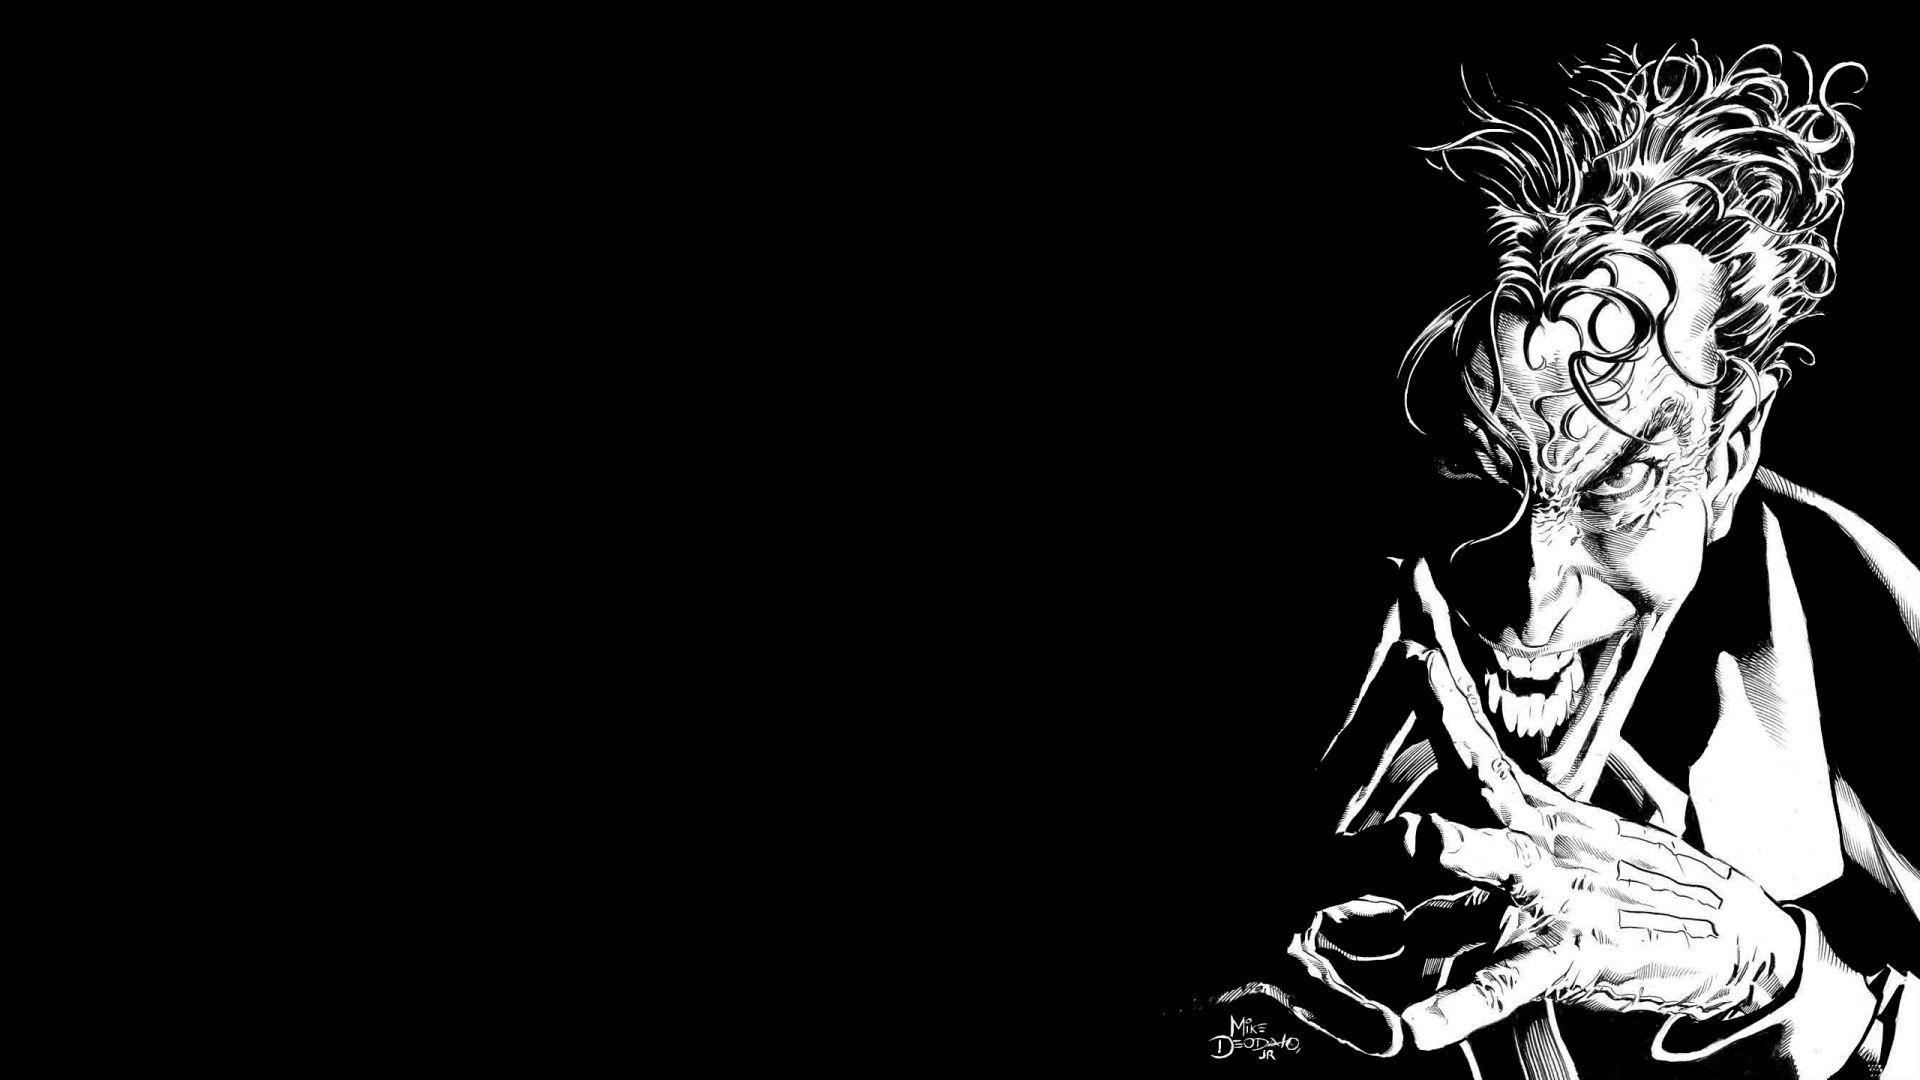 Zendha Black And White Wallpaper Joker